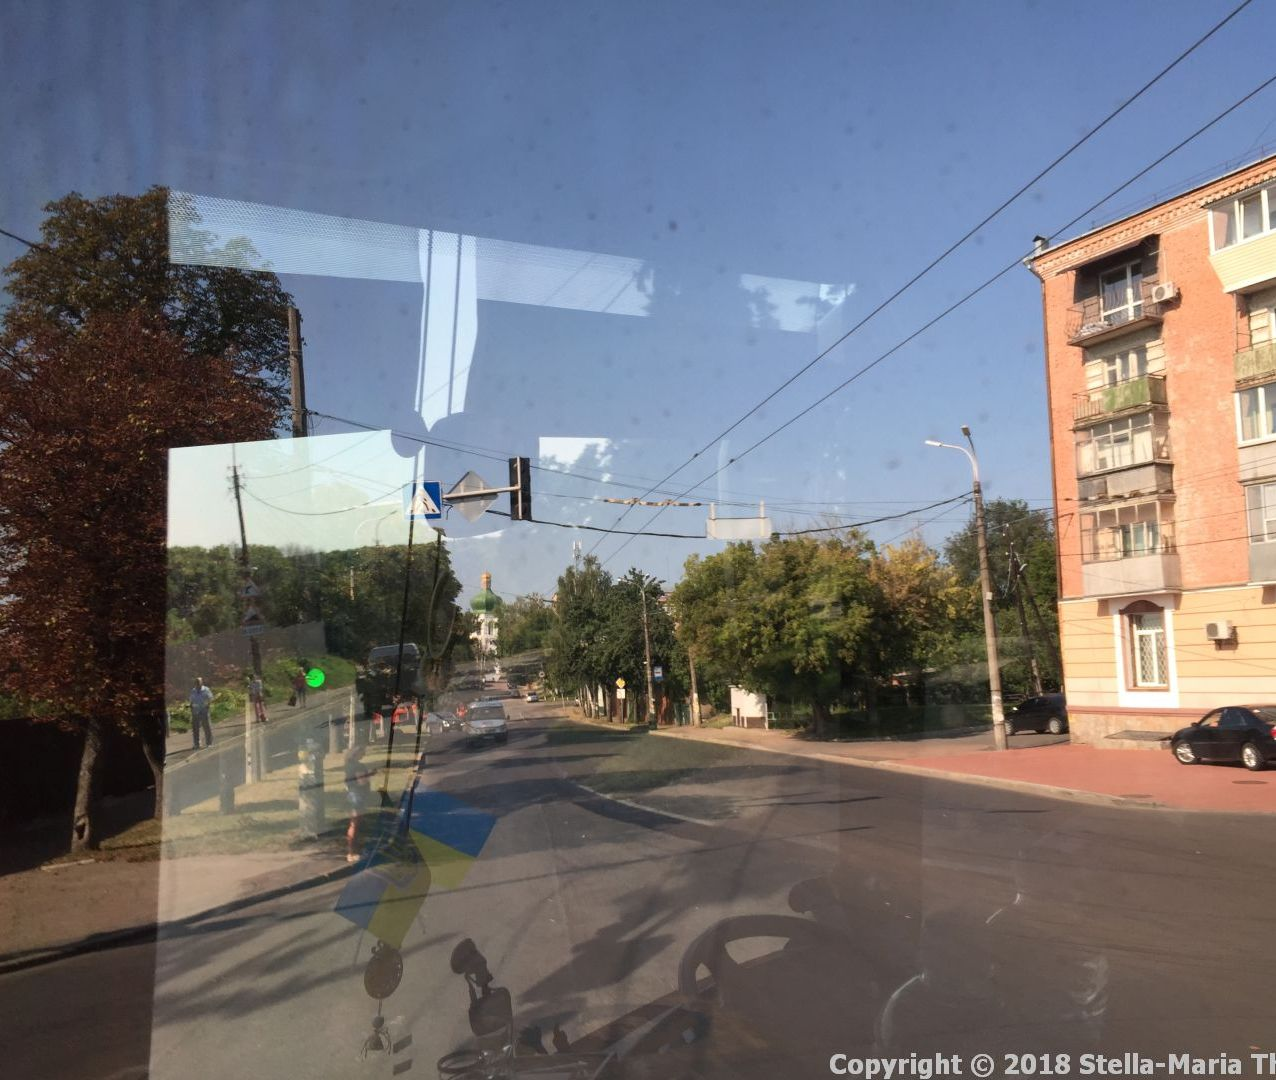 ON THE ROAD, THE UKRAINE 022